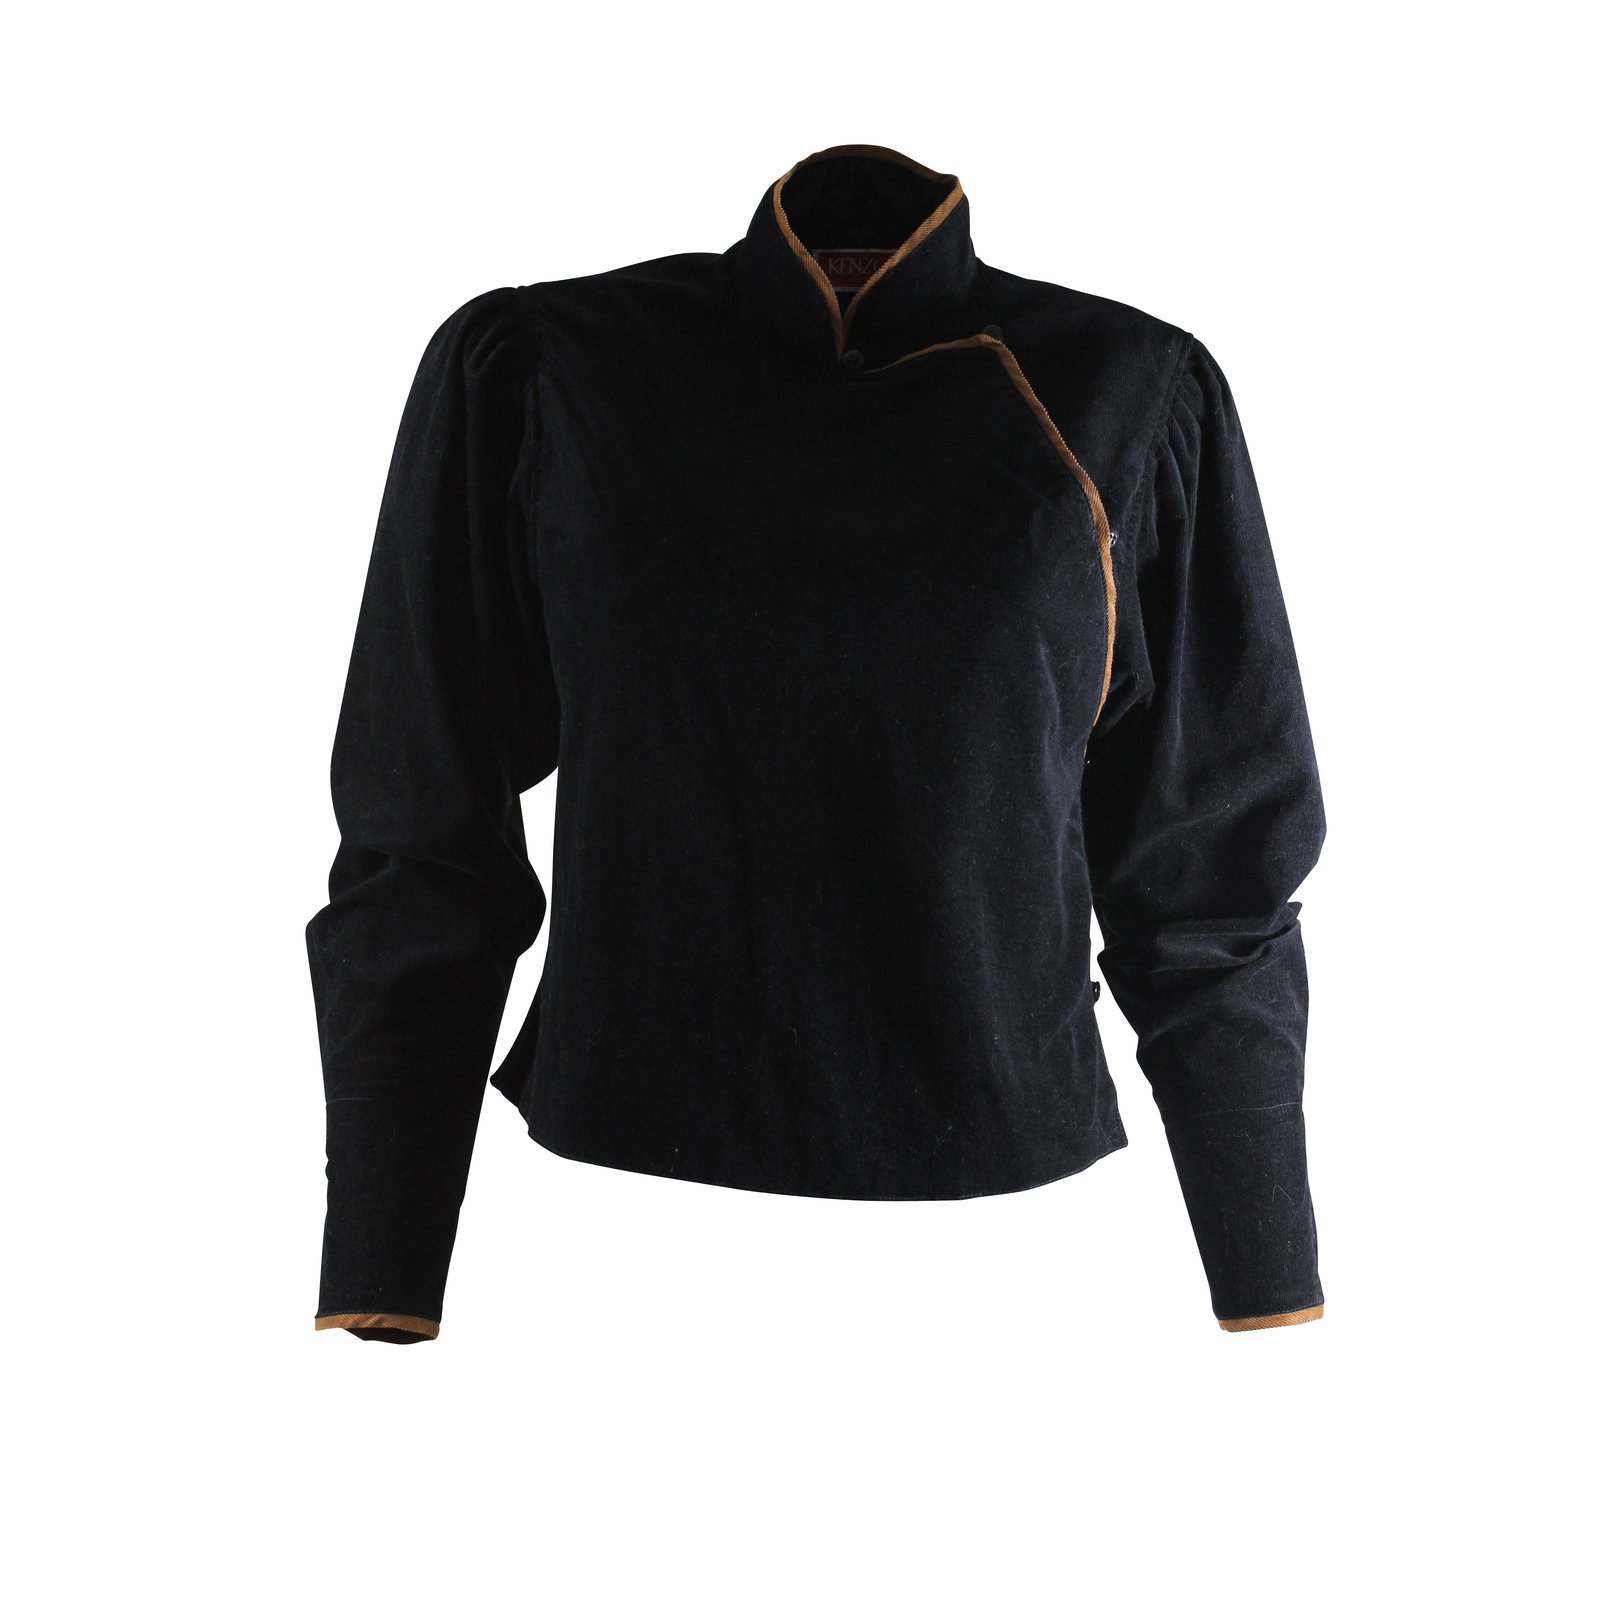 vestes kenzo veste vintage style kimono velours noir joli closet. Black Bedroom Furniture Sets. Home Design Ideas